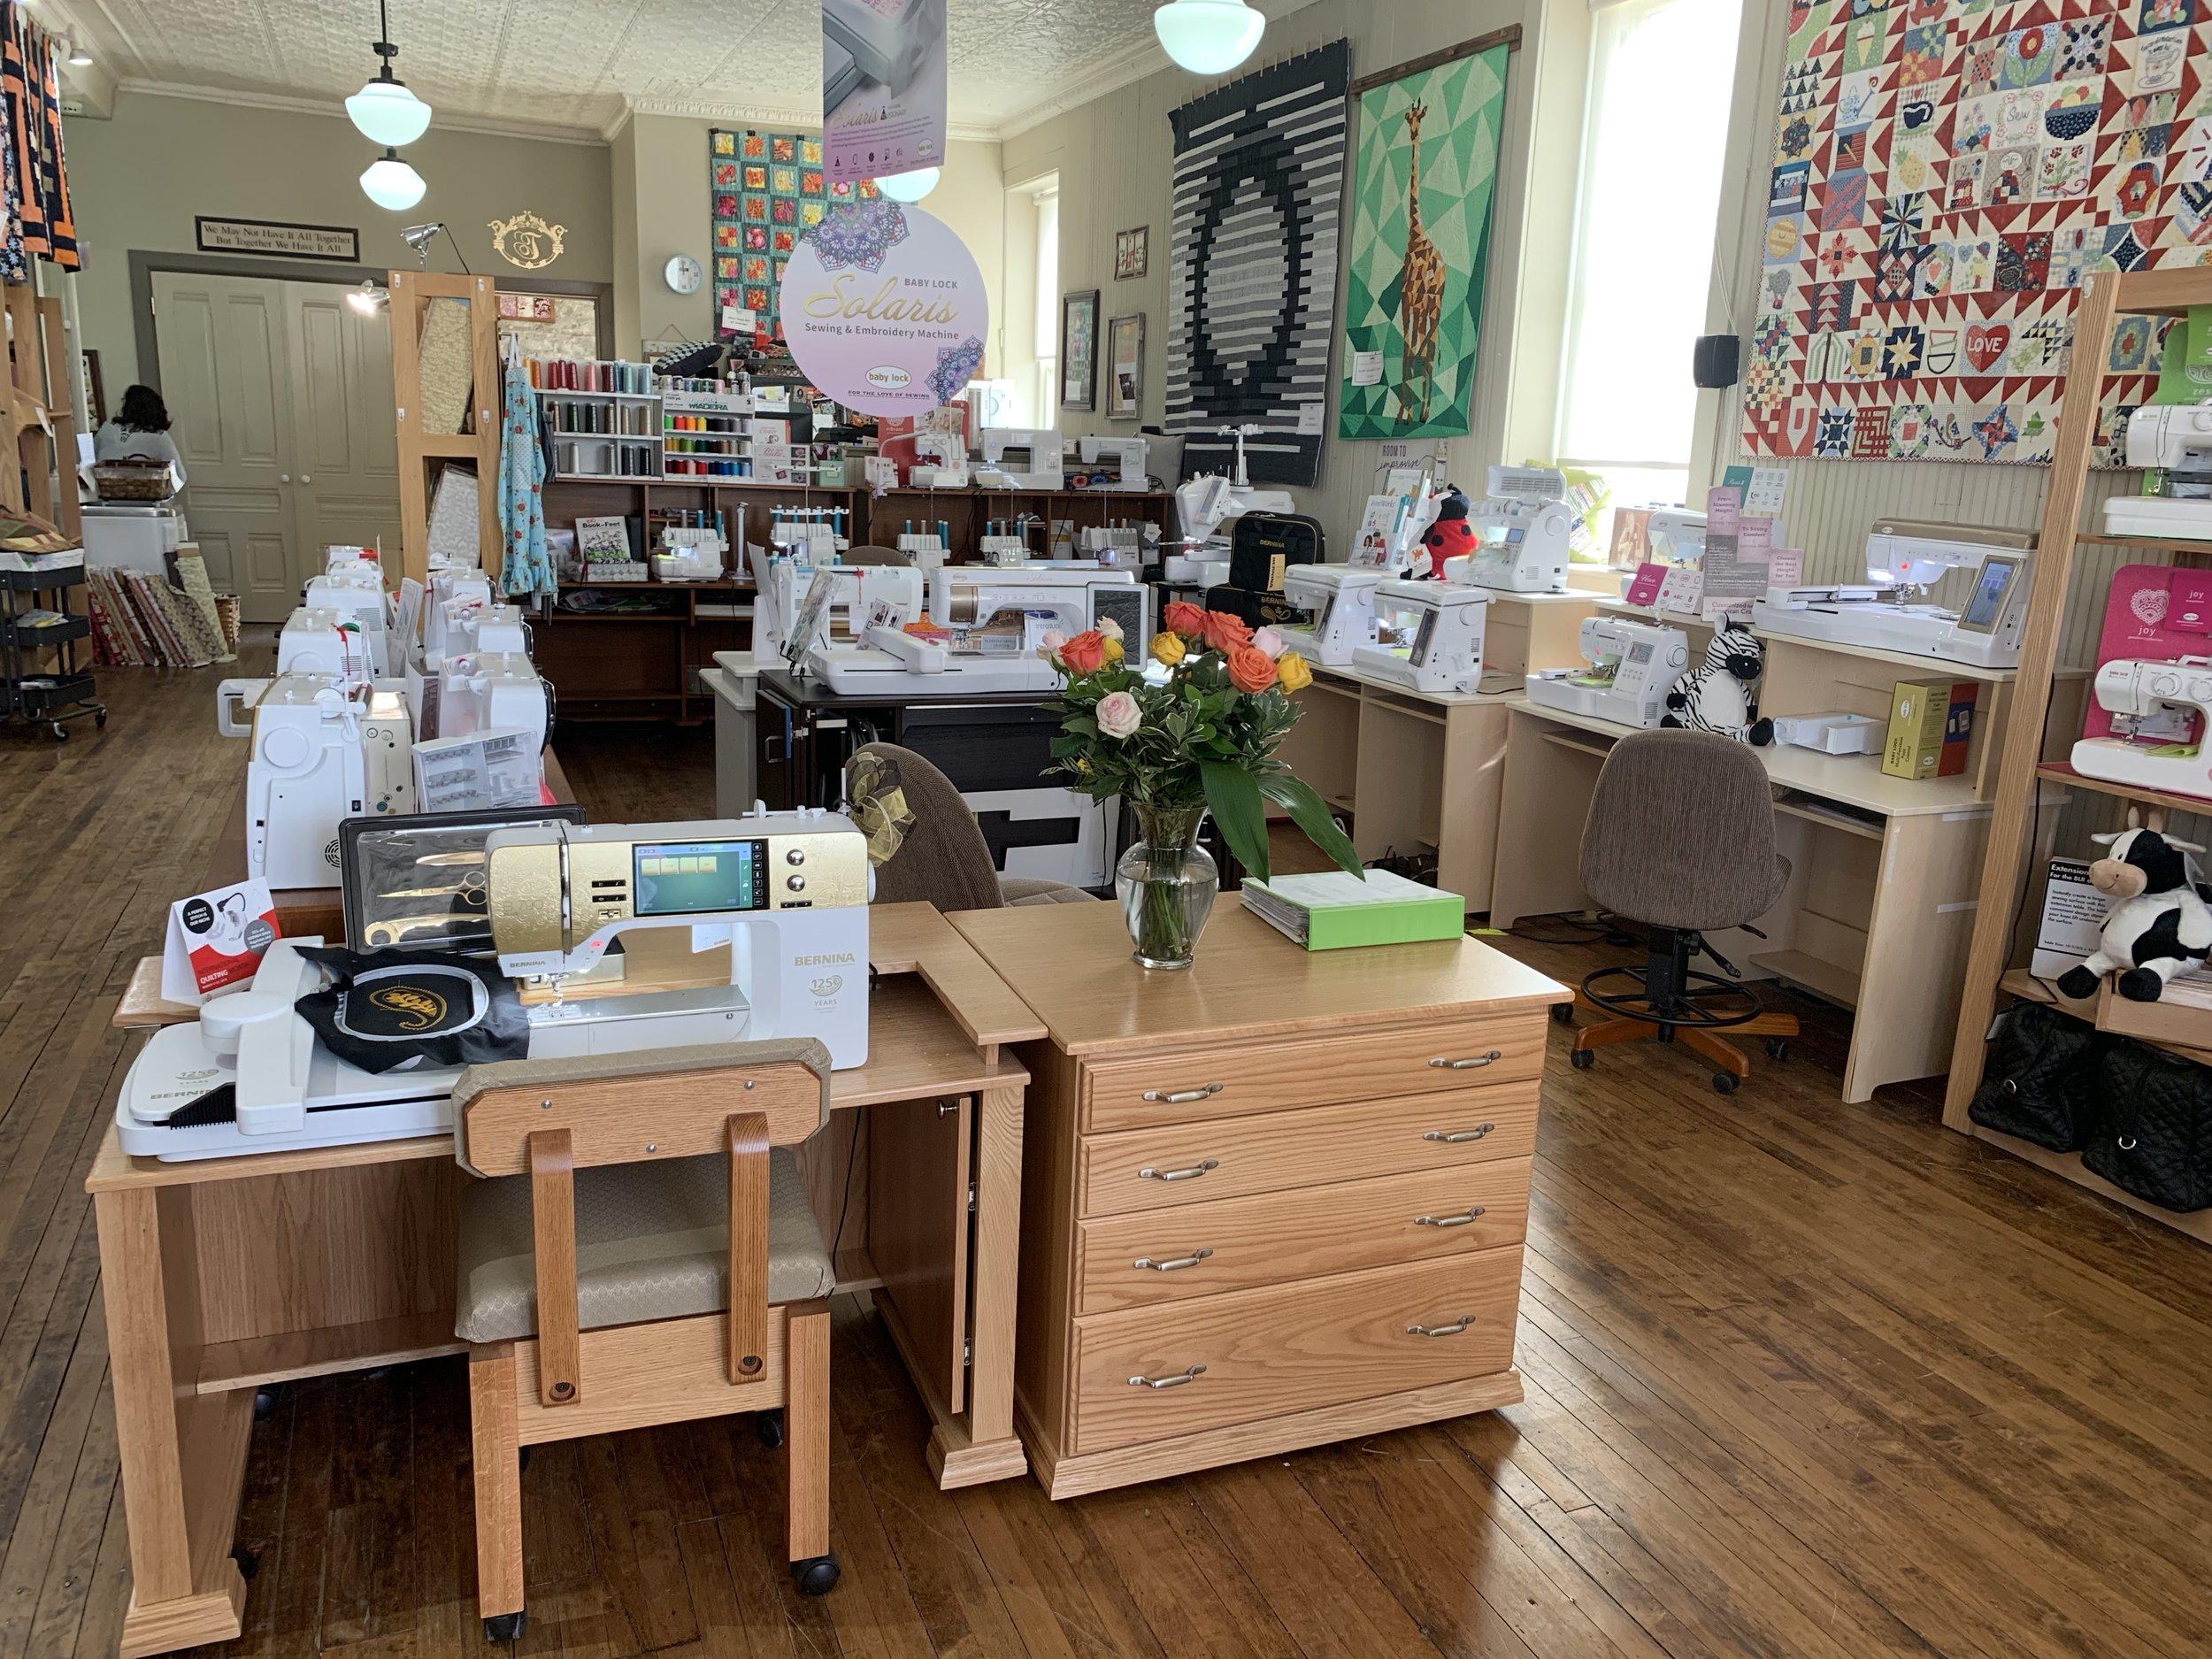 Sewing Machine Displays